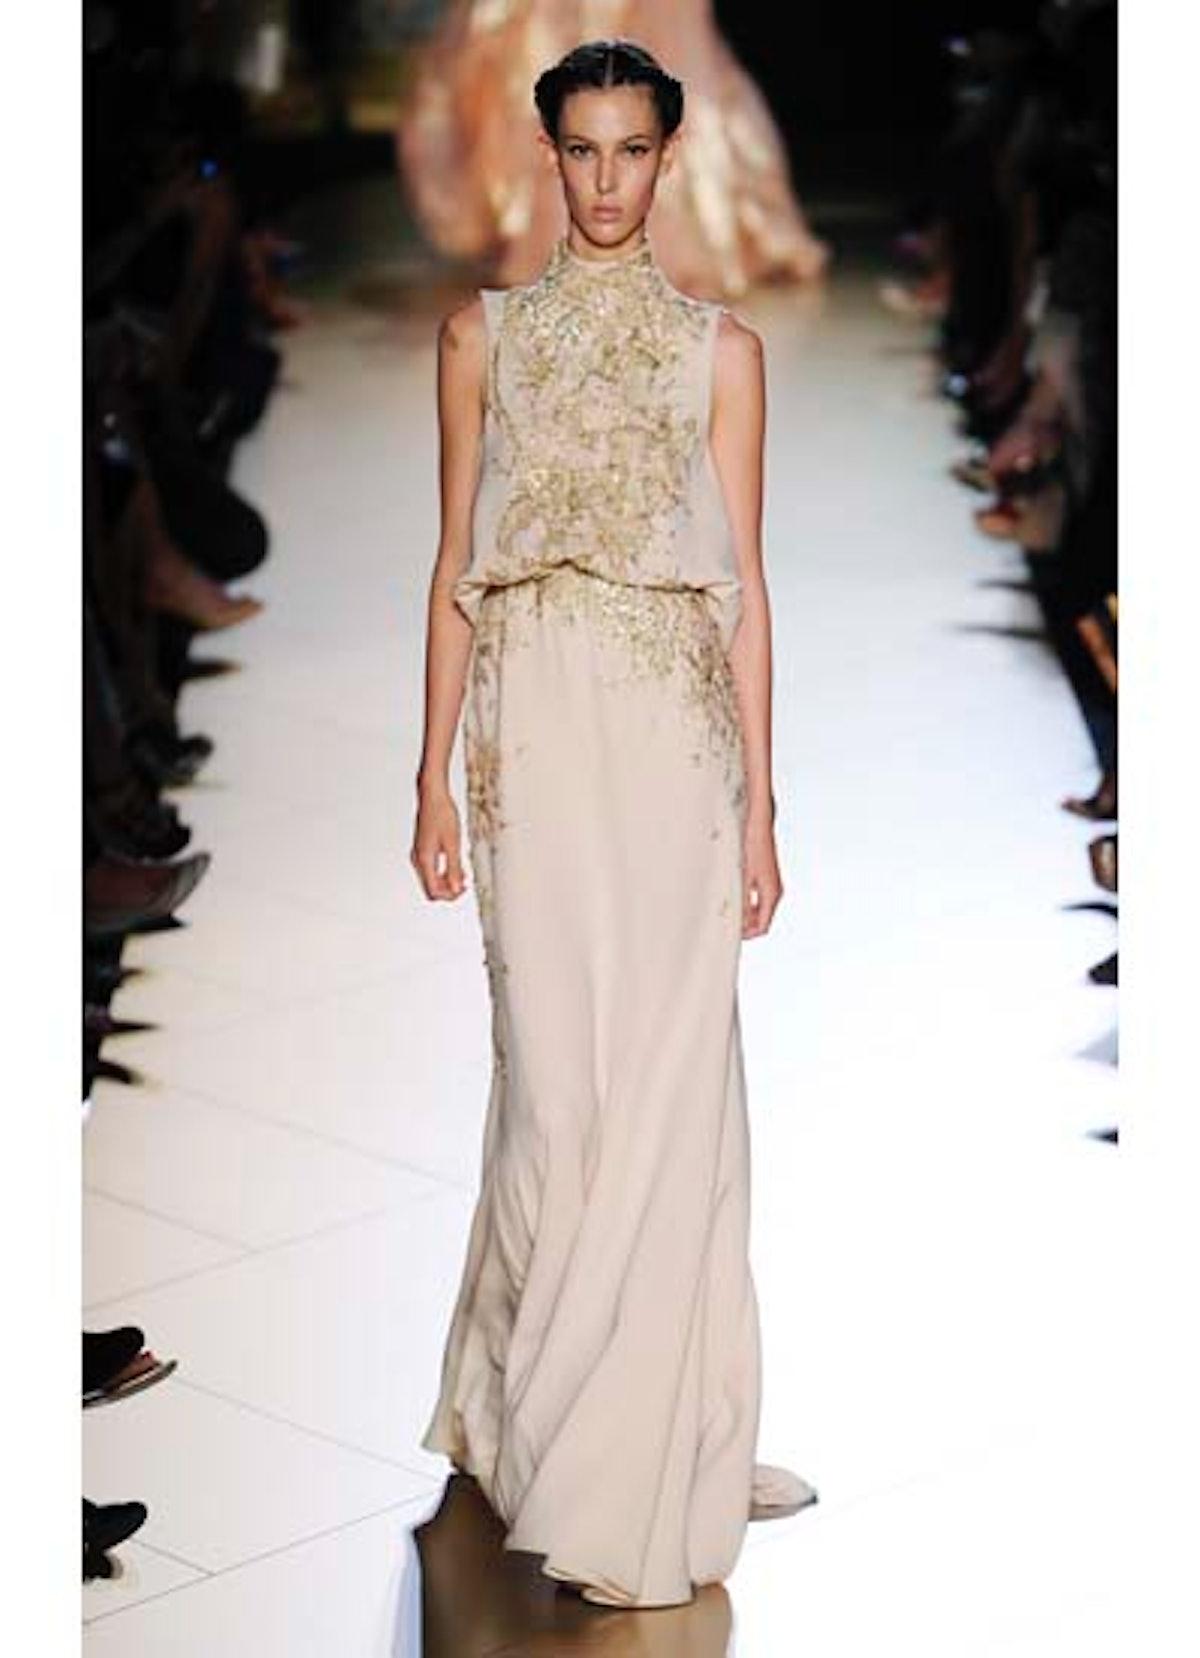 fass-elie-saab-couture-2012-runway-13-v.jpg